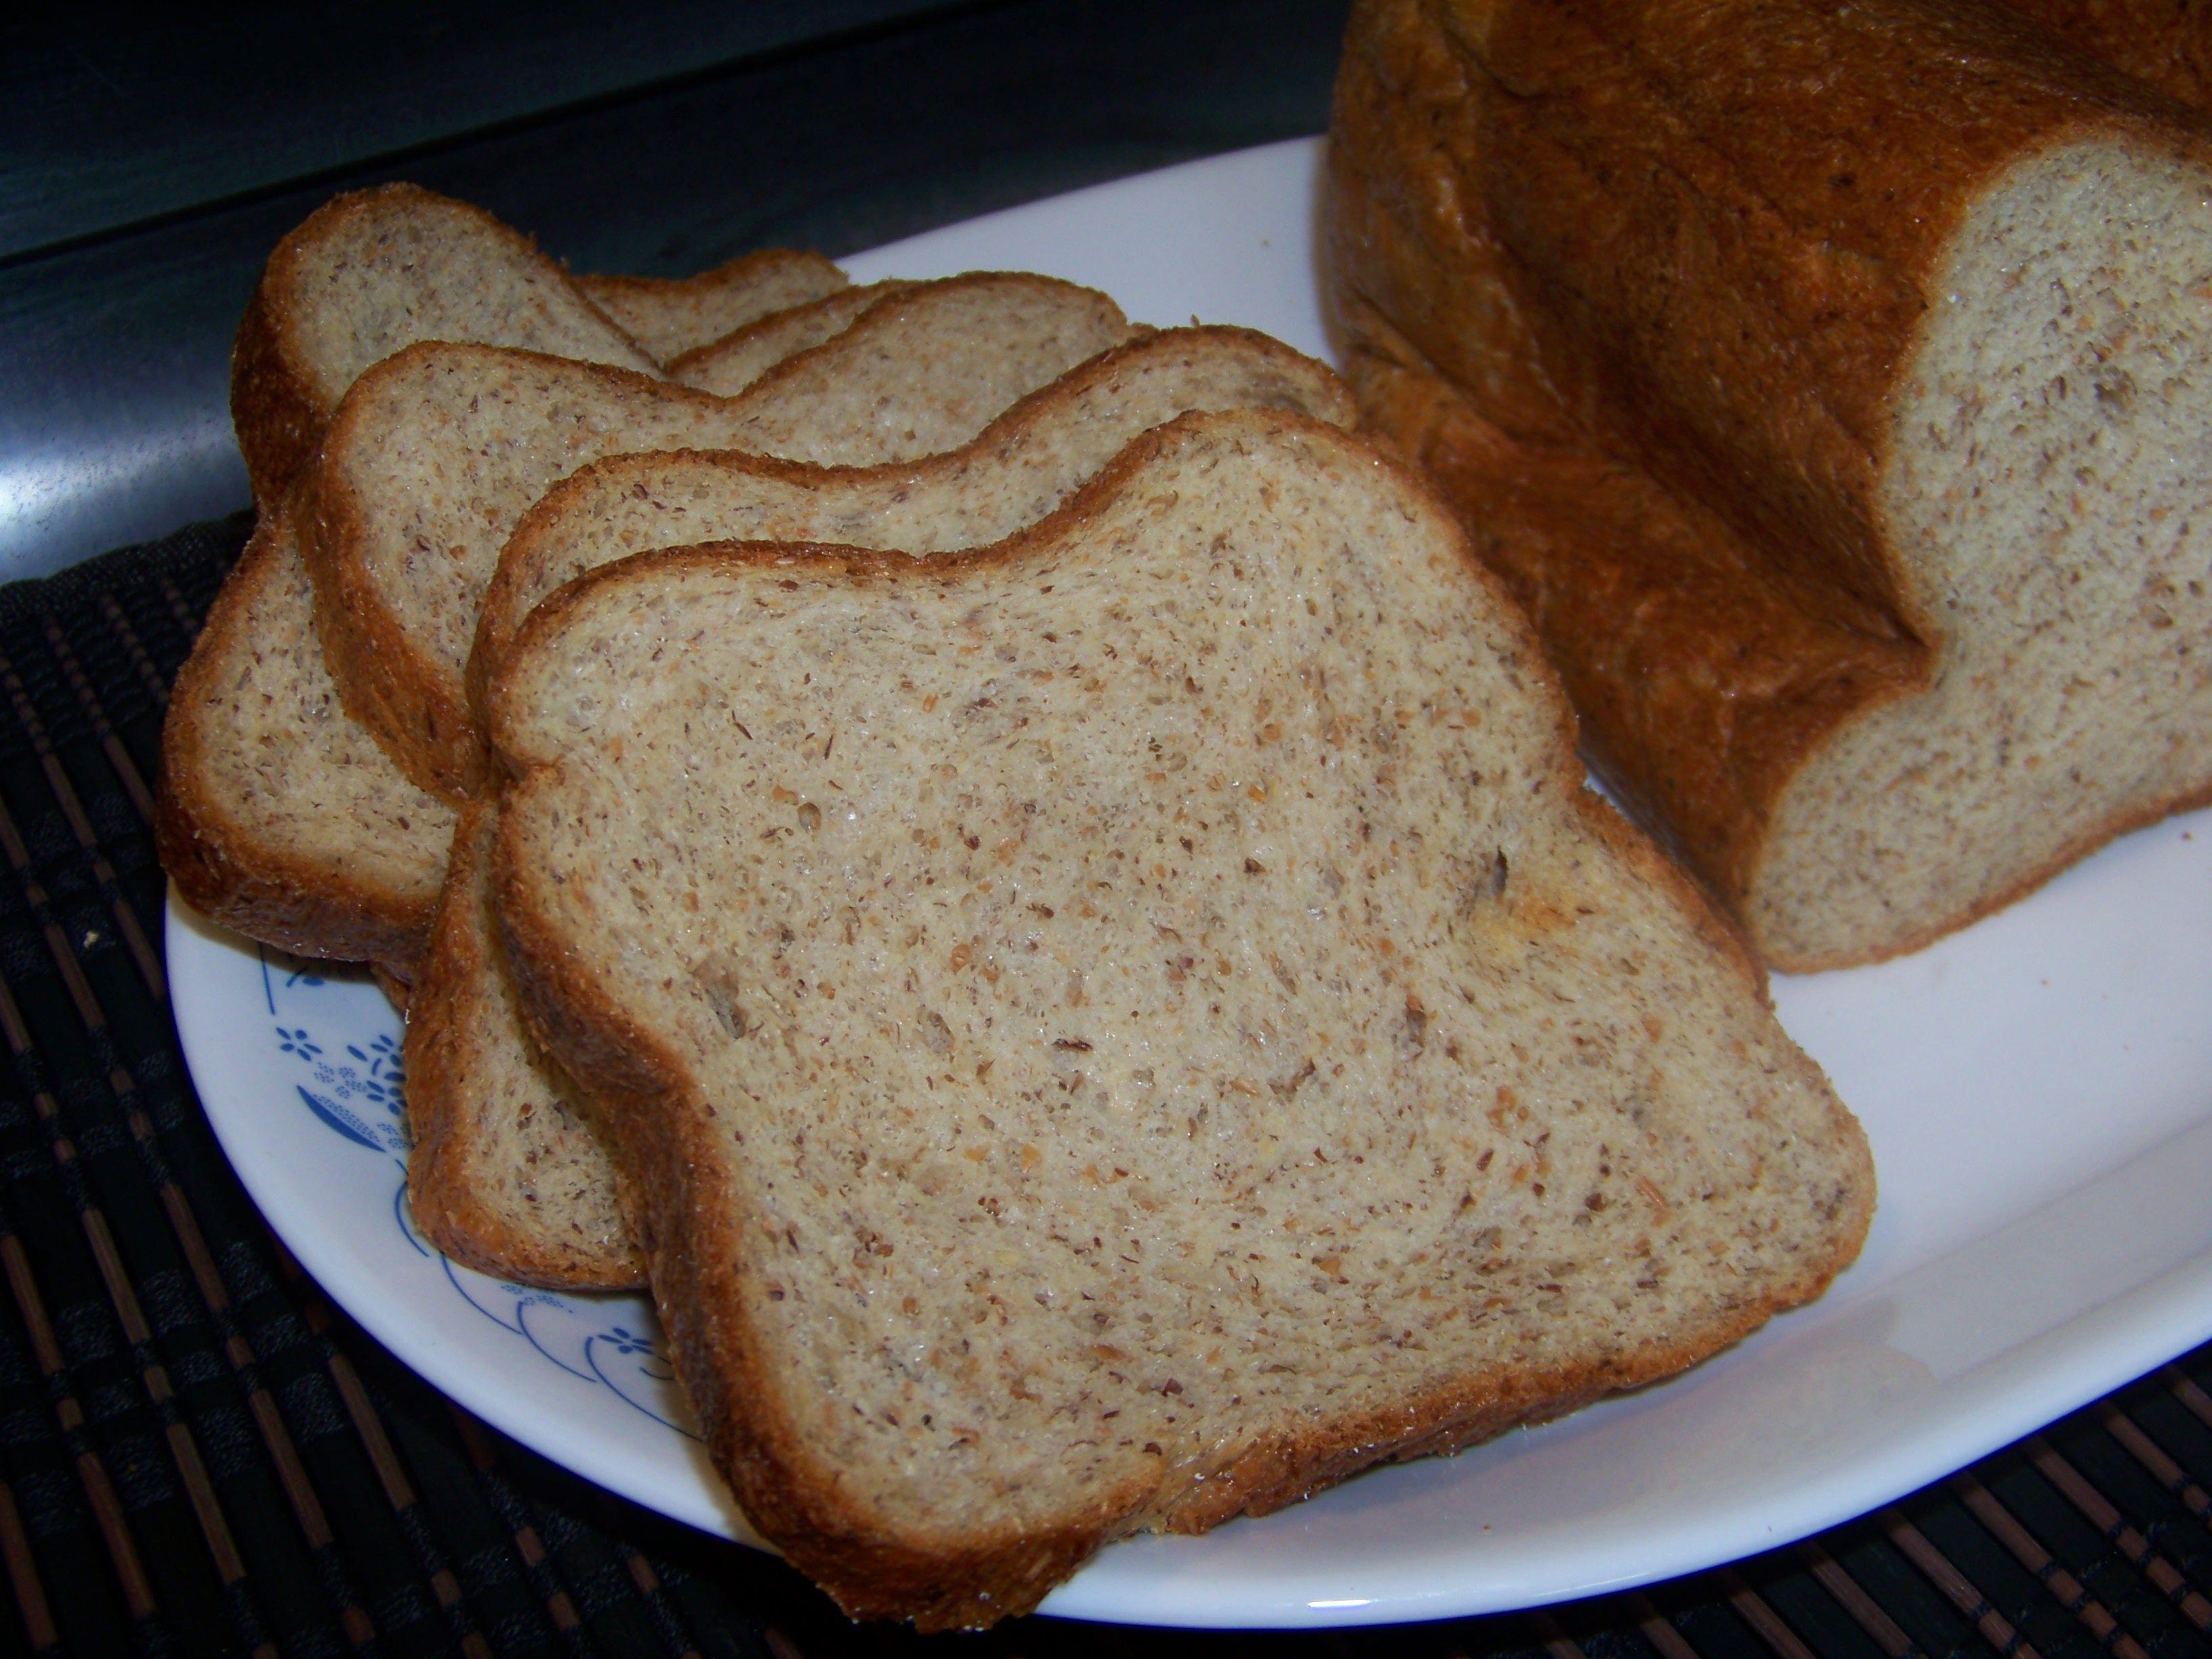 Gabi S Low Carb Yeast Bread Recipe For Bread Machine